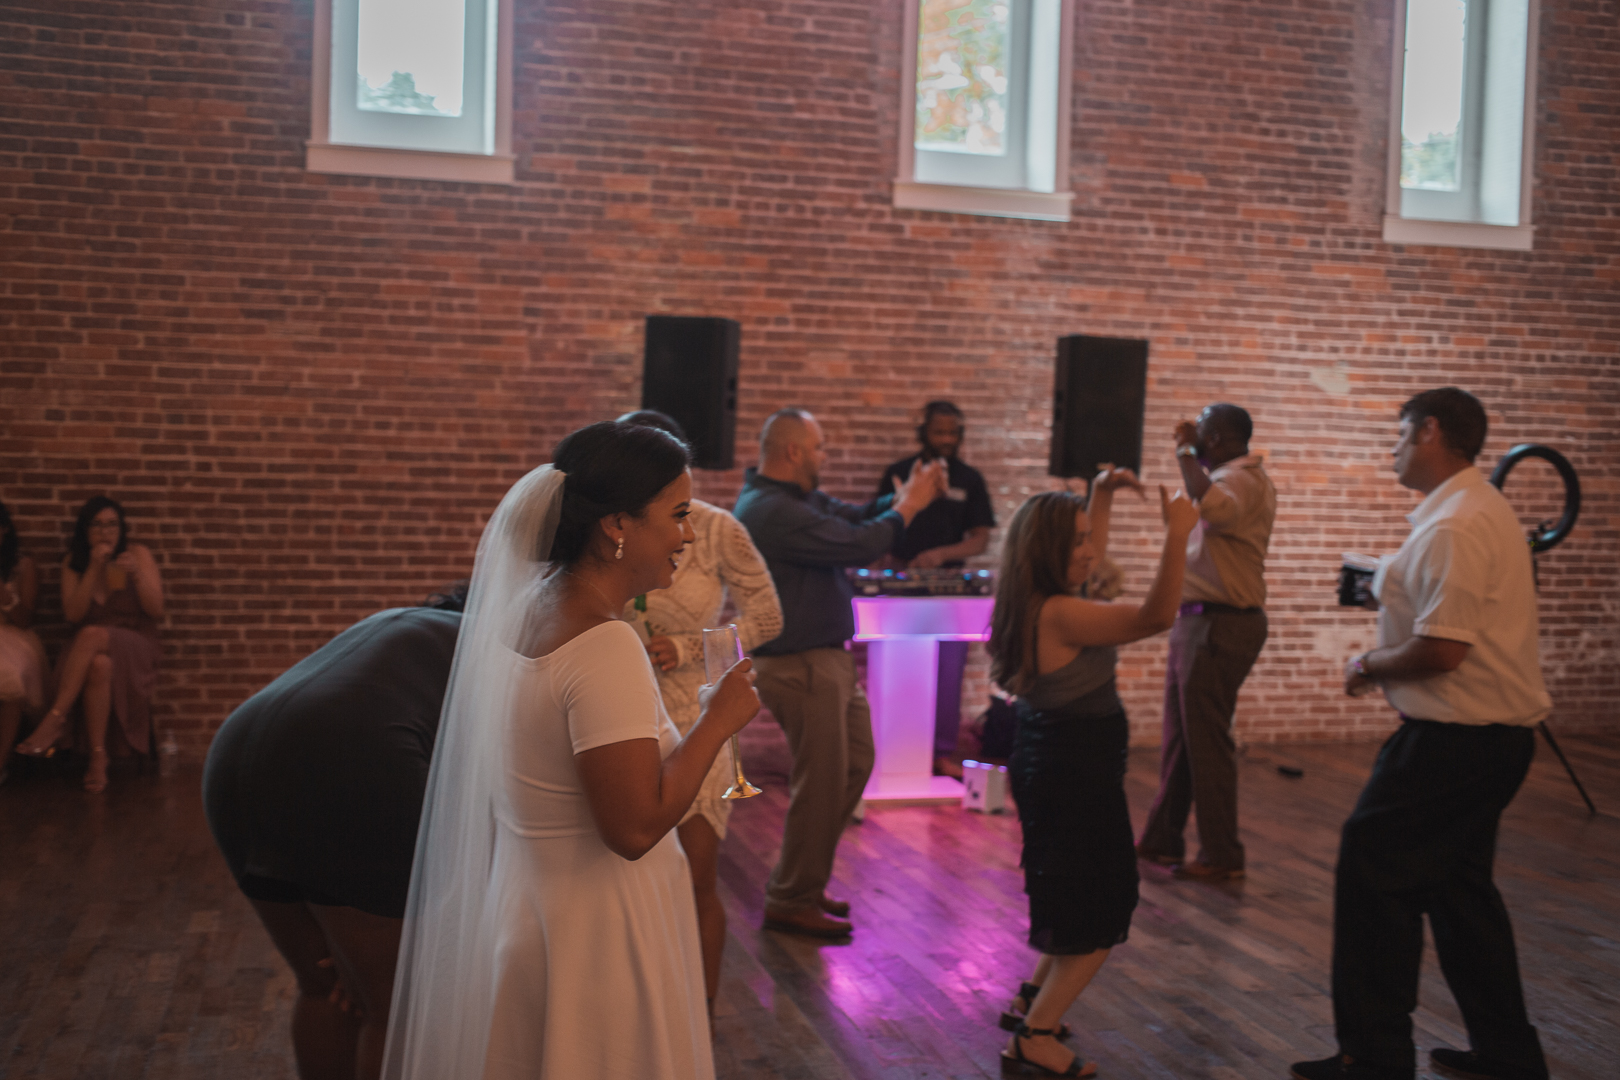 Richard & Carol's Wedding(8-17-19) Edited5719.jpg